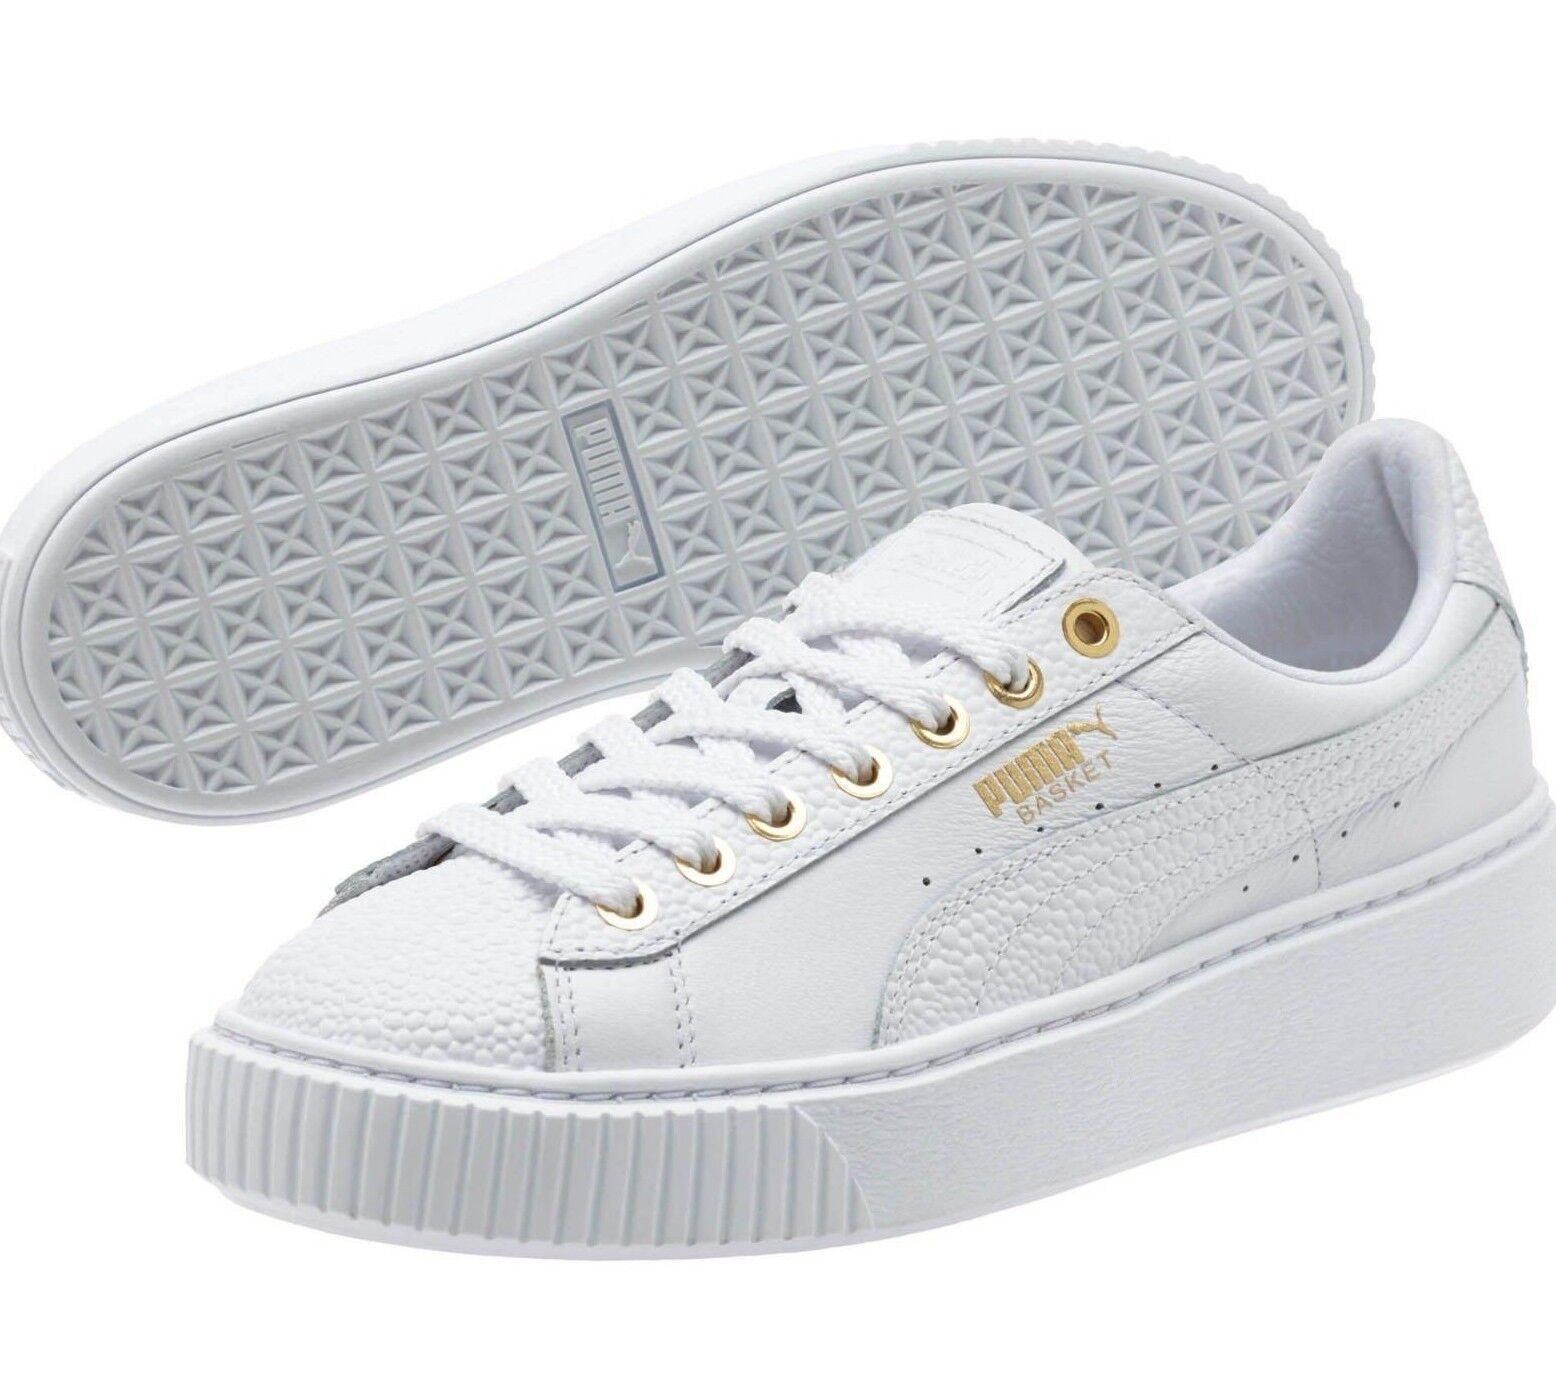 New Women's Puma Basket Platform Pearlized 364233-01 White Gold Sneaker US 10.5